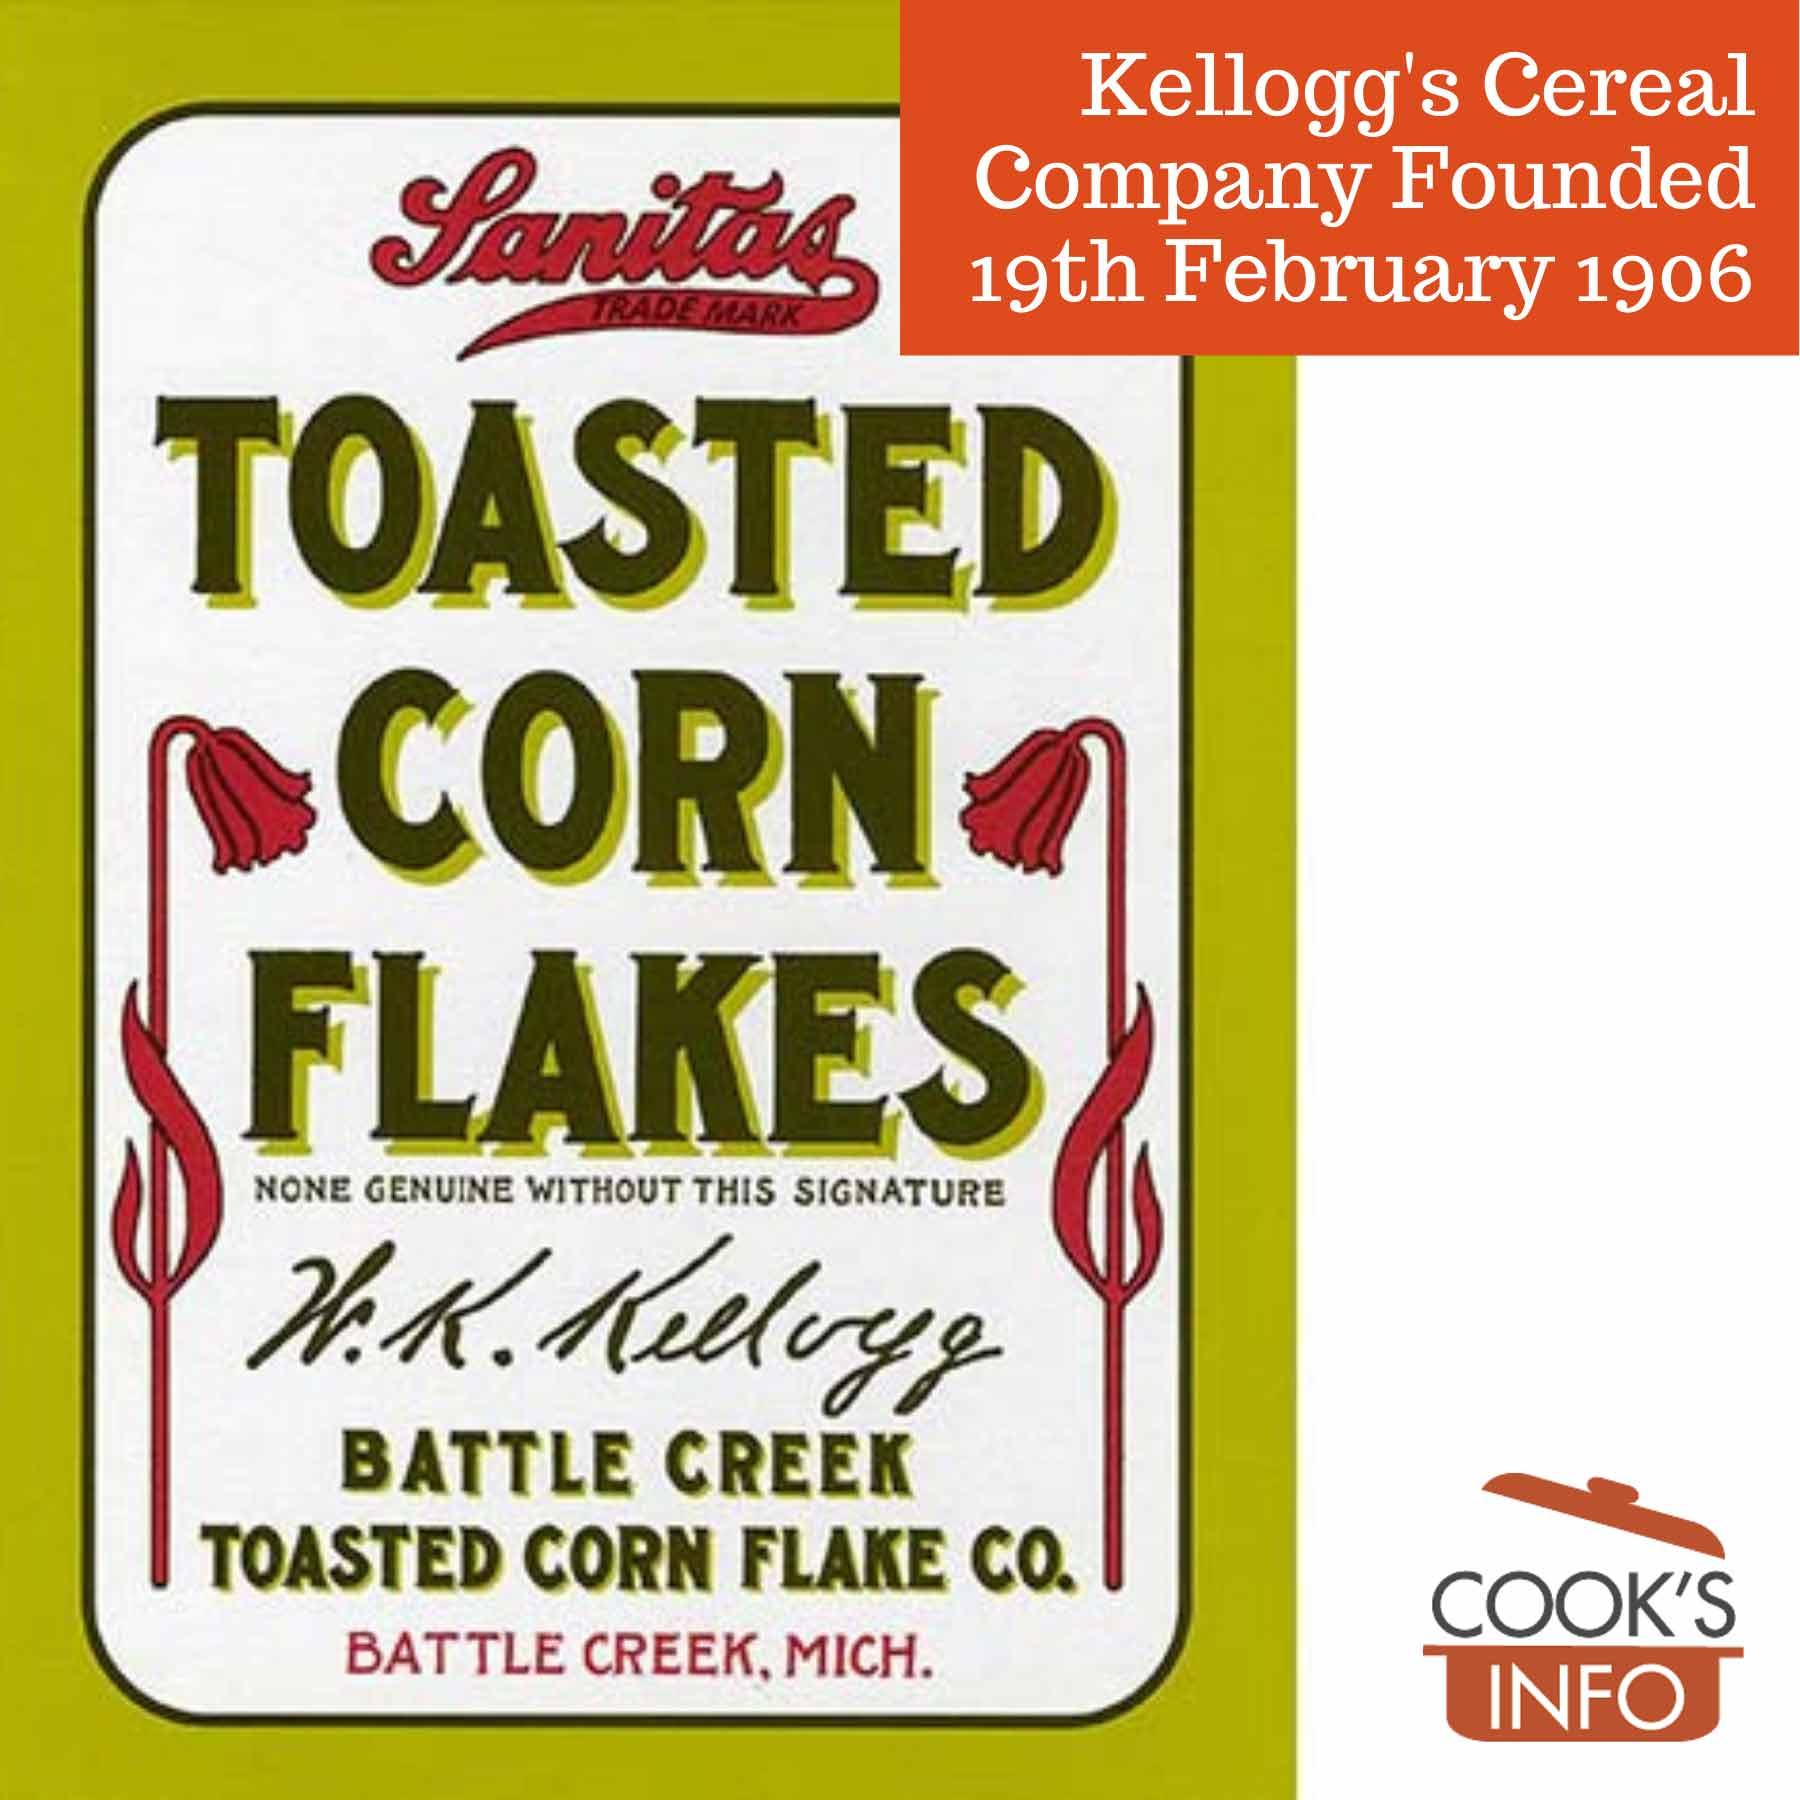 Original 1906 Kellogg's Corn Flakes box